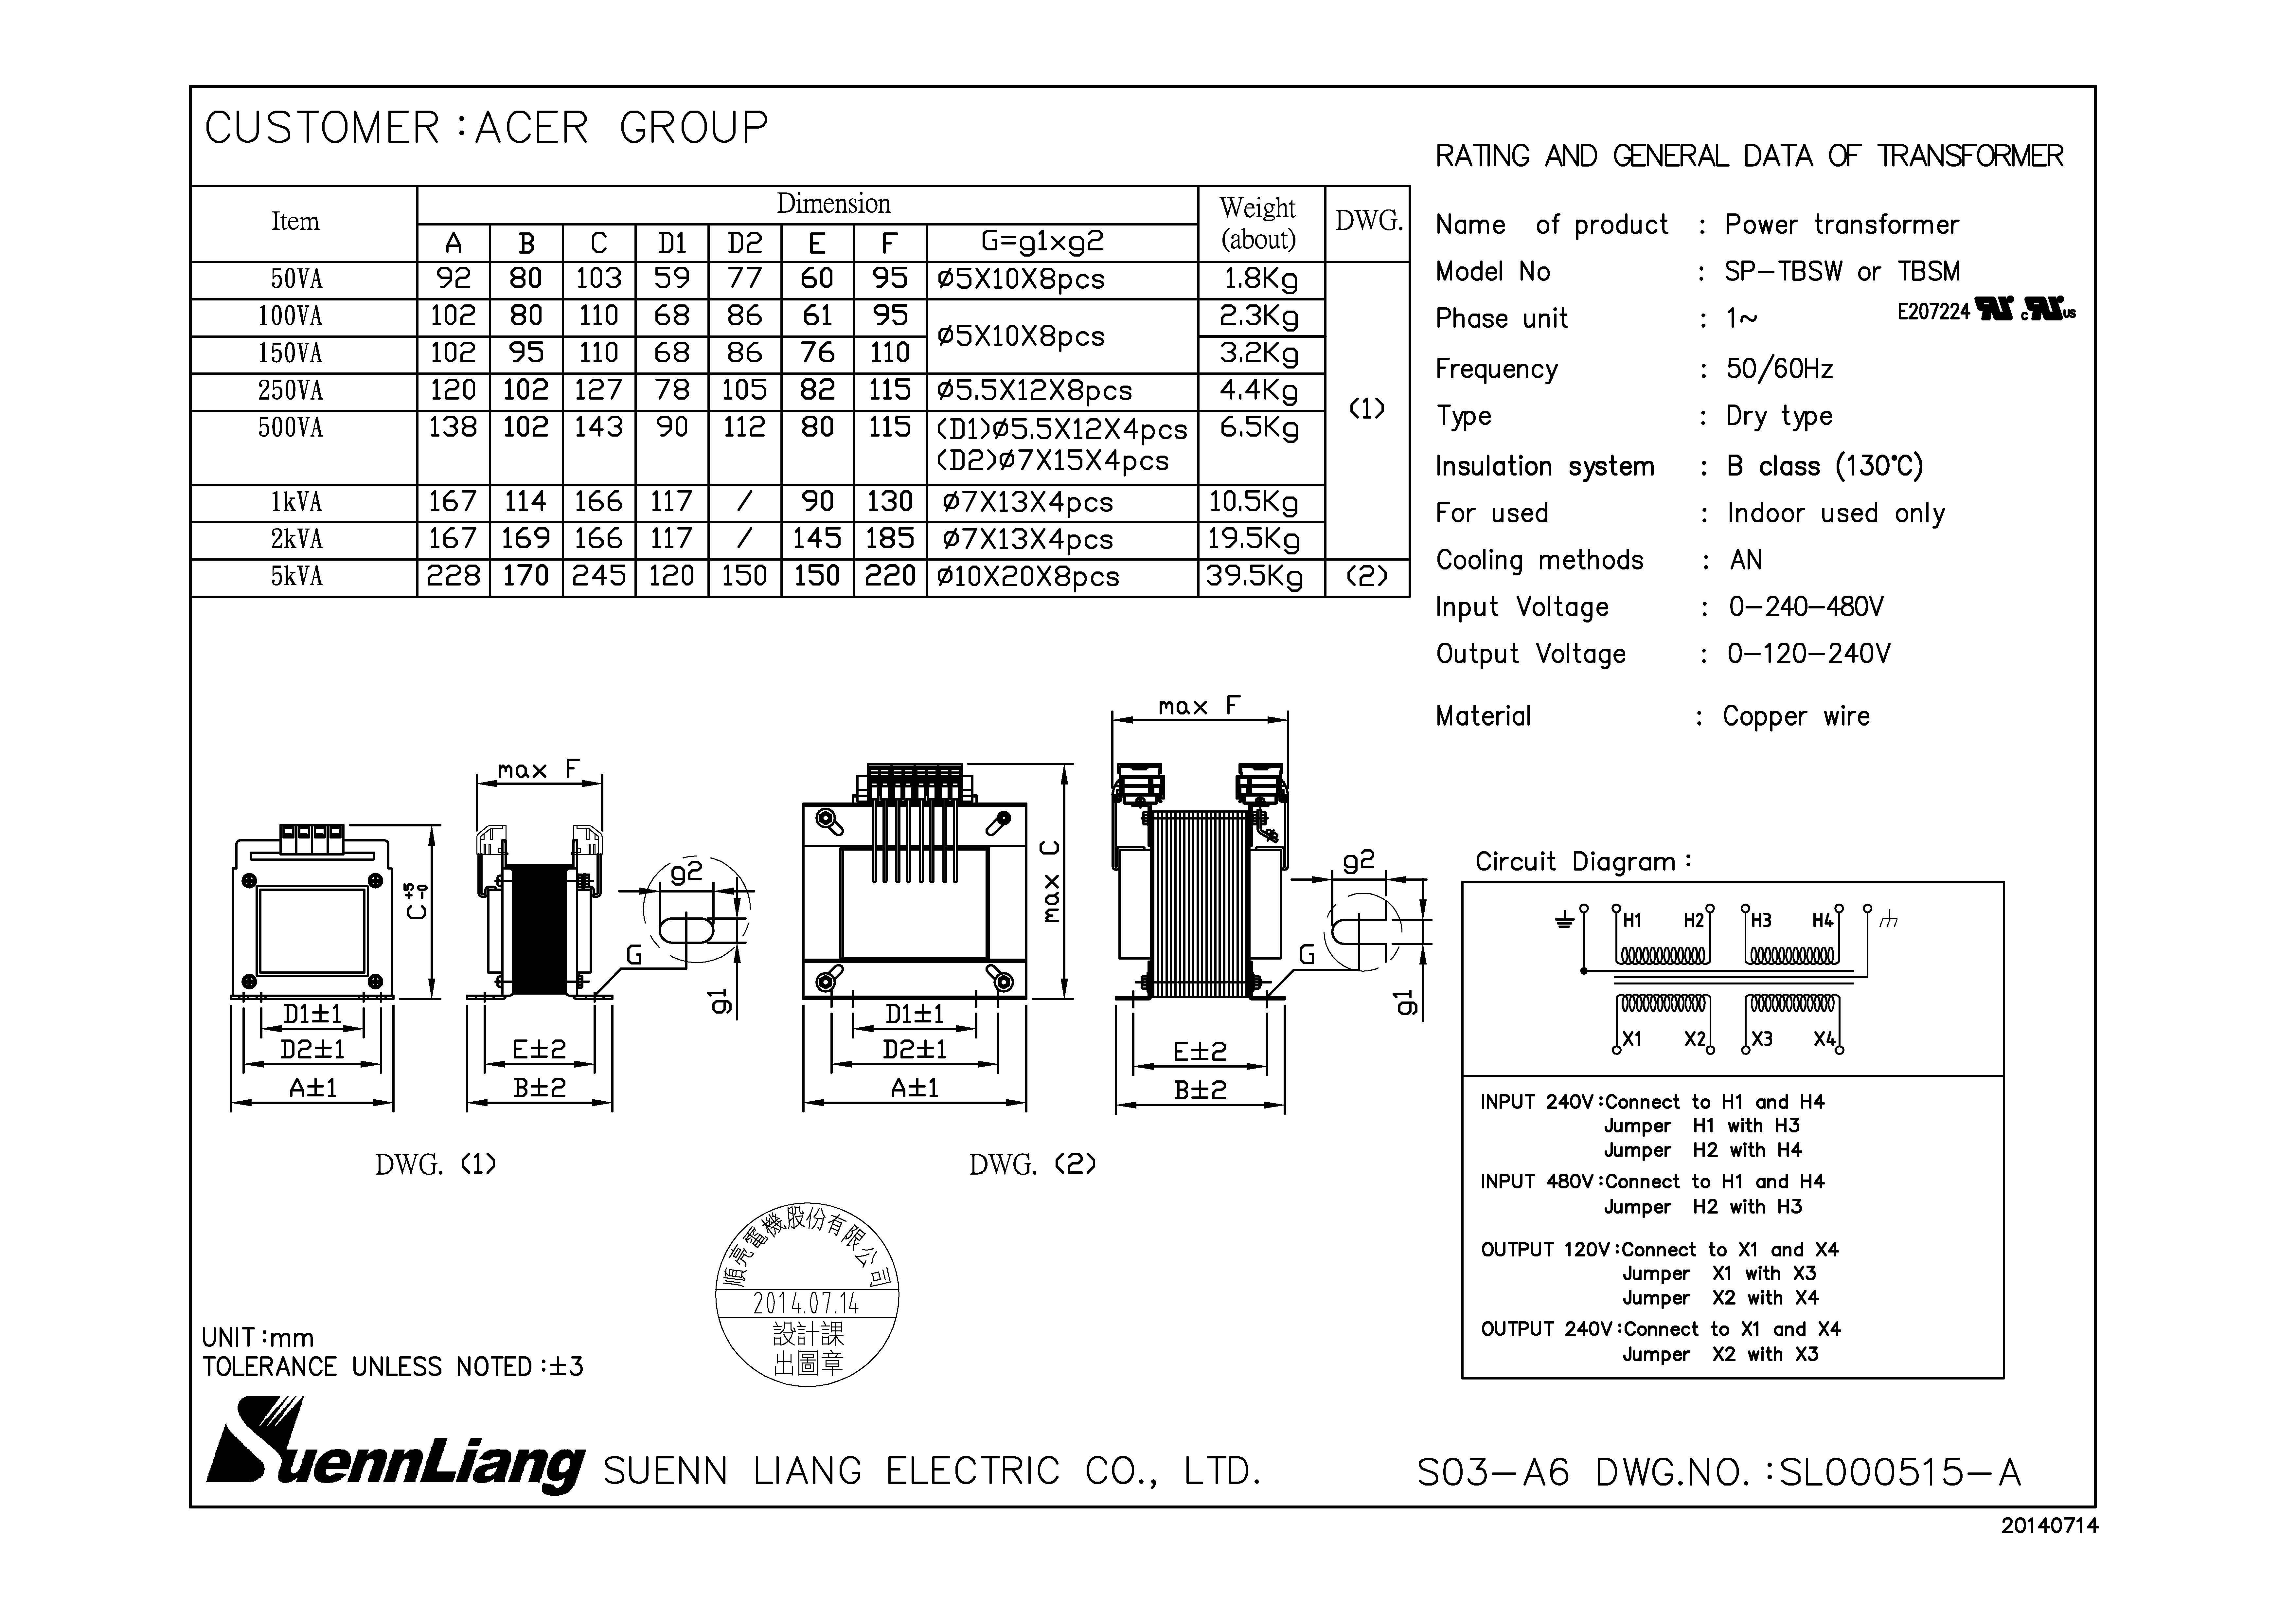 f15000 60 hz input  240  480v output  120  240v